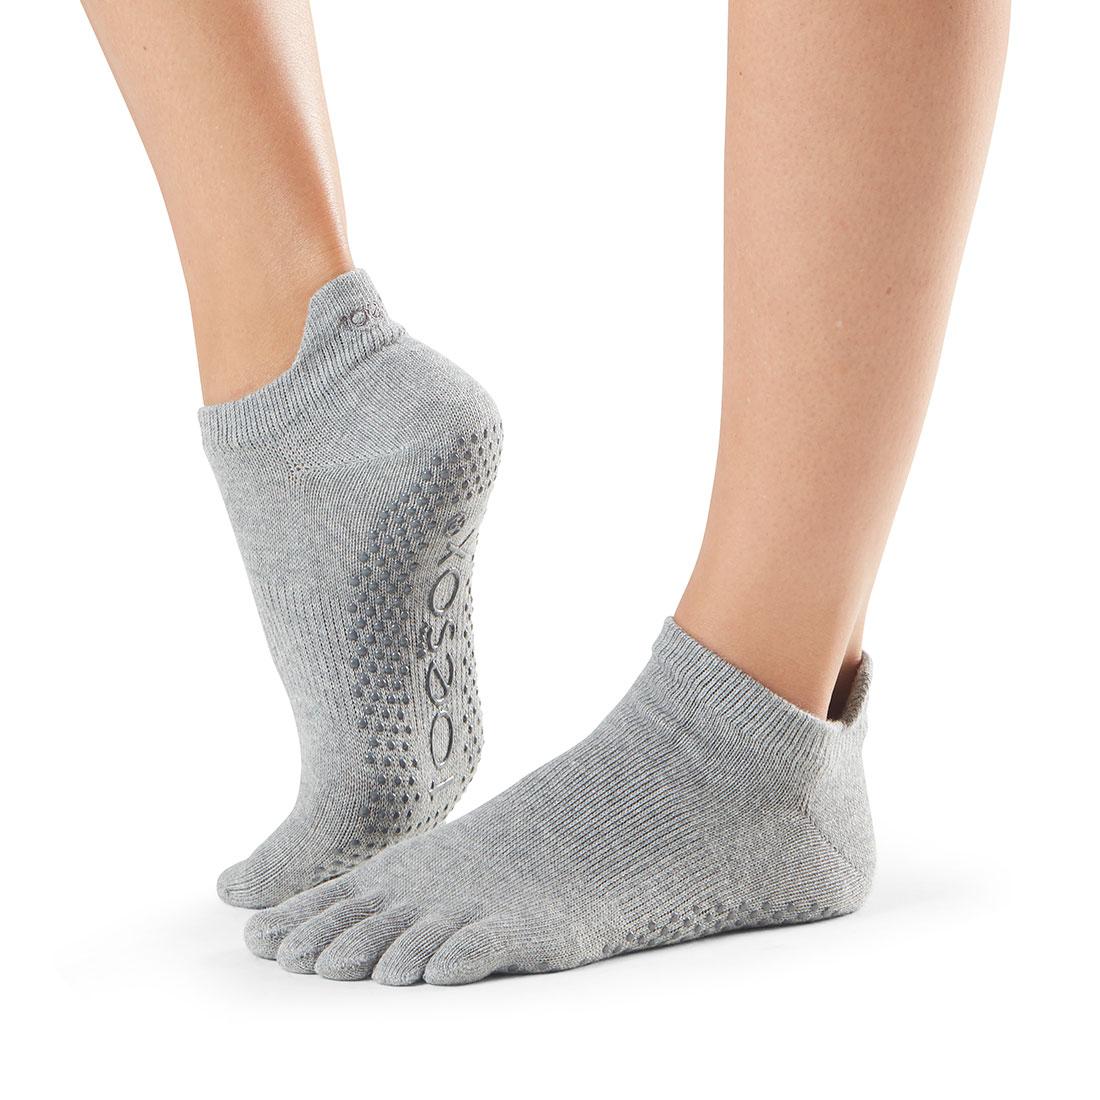 Yogasocken ToeSox Low Rise Full Toe Heather Grey